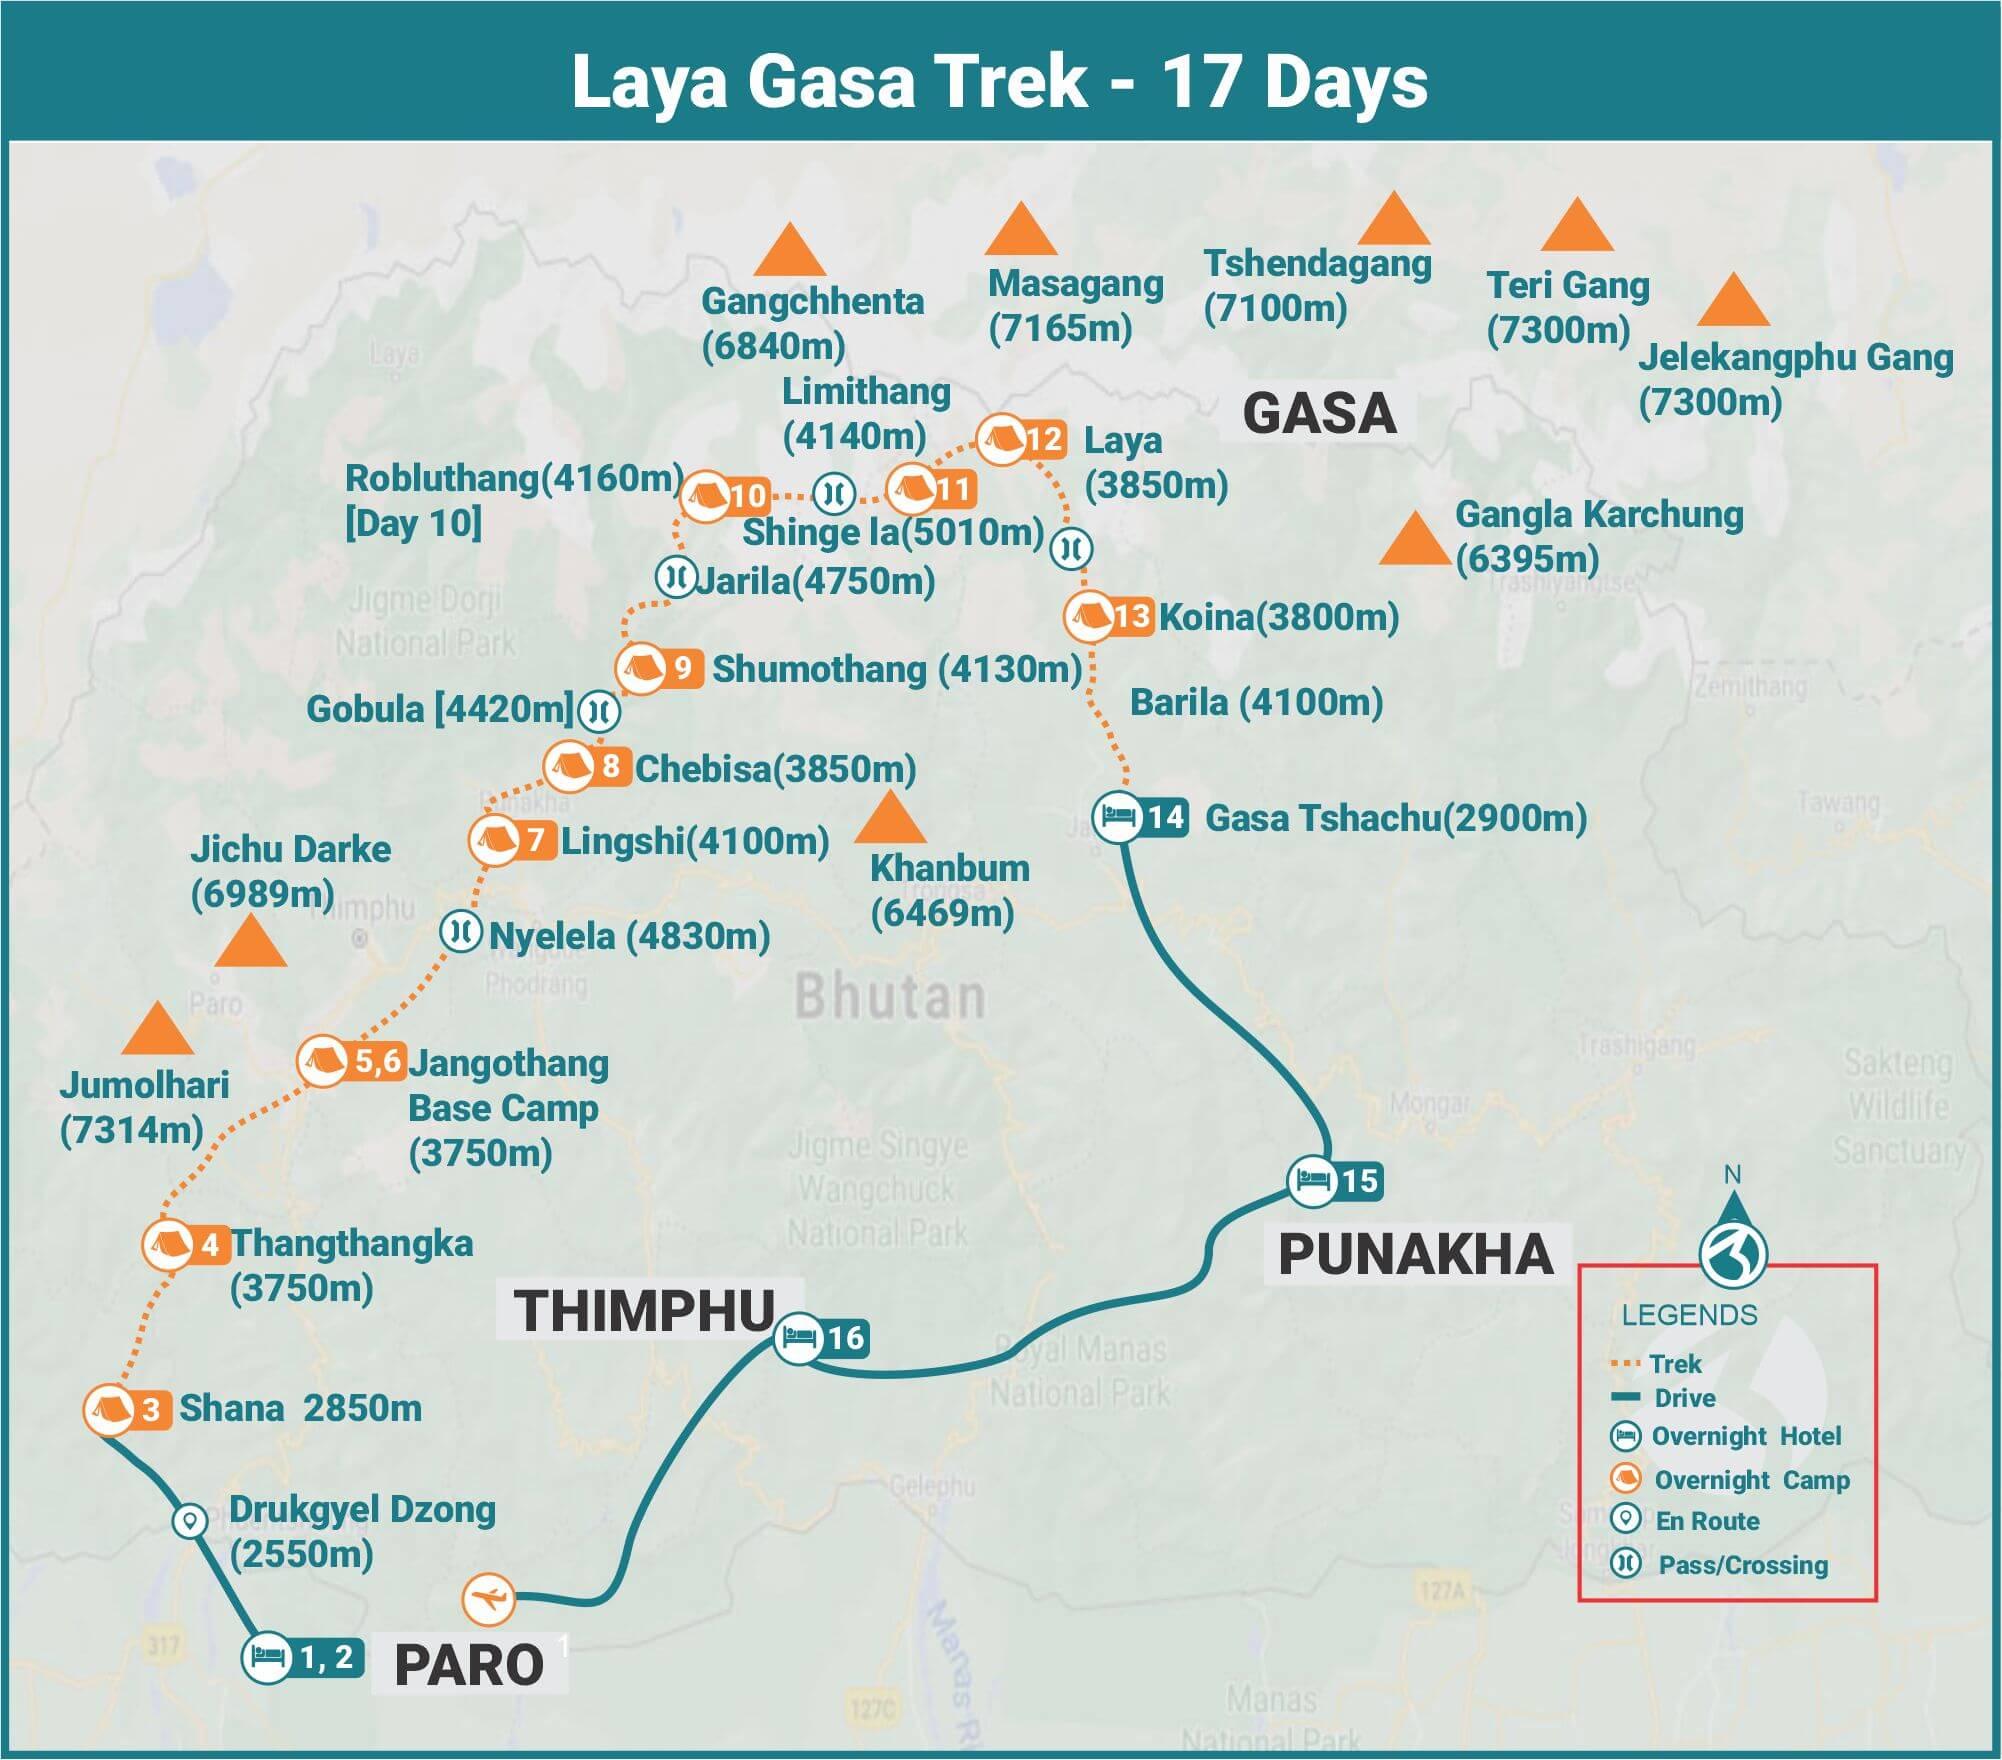 Laya Gasa Trek 17 Days Route Map